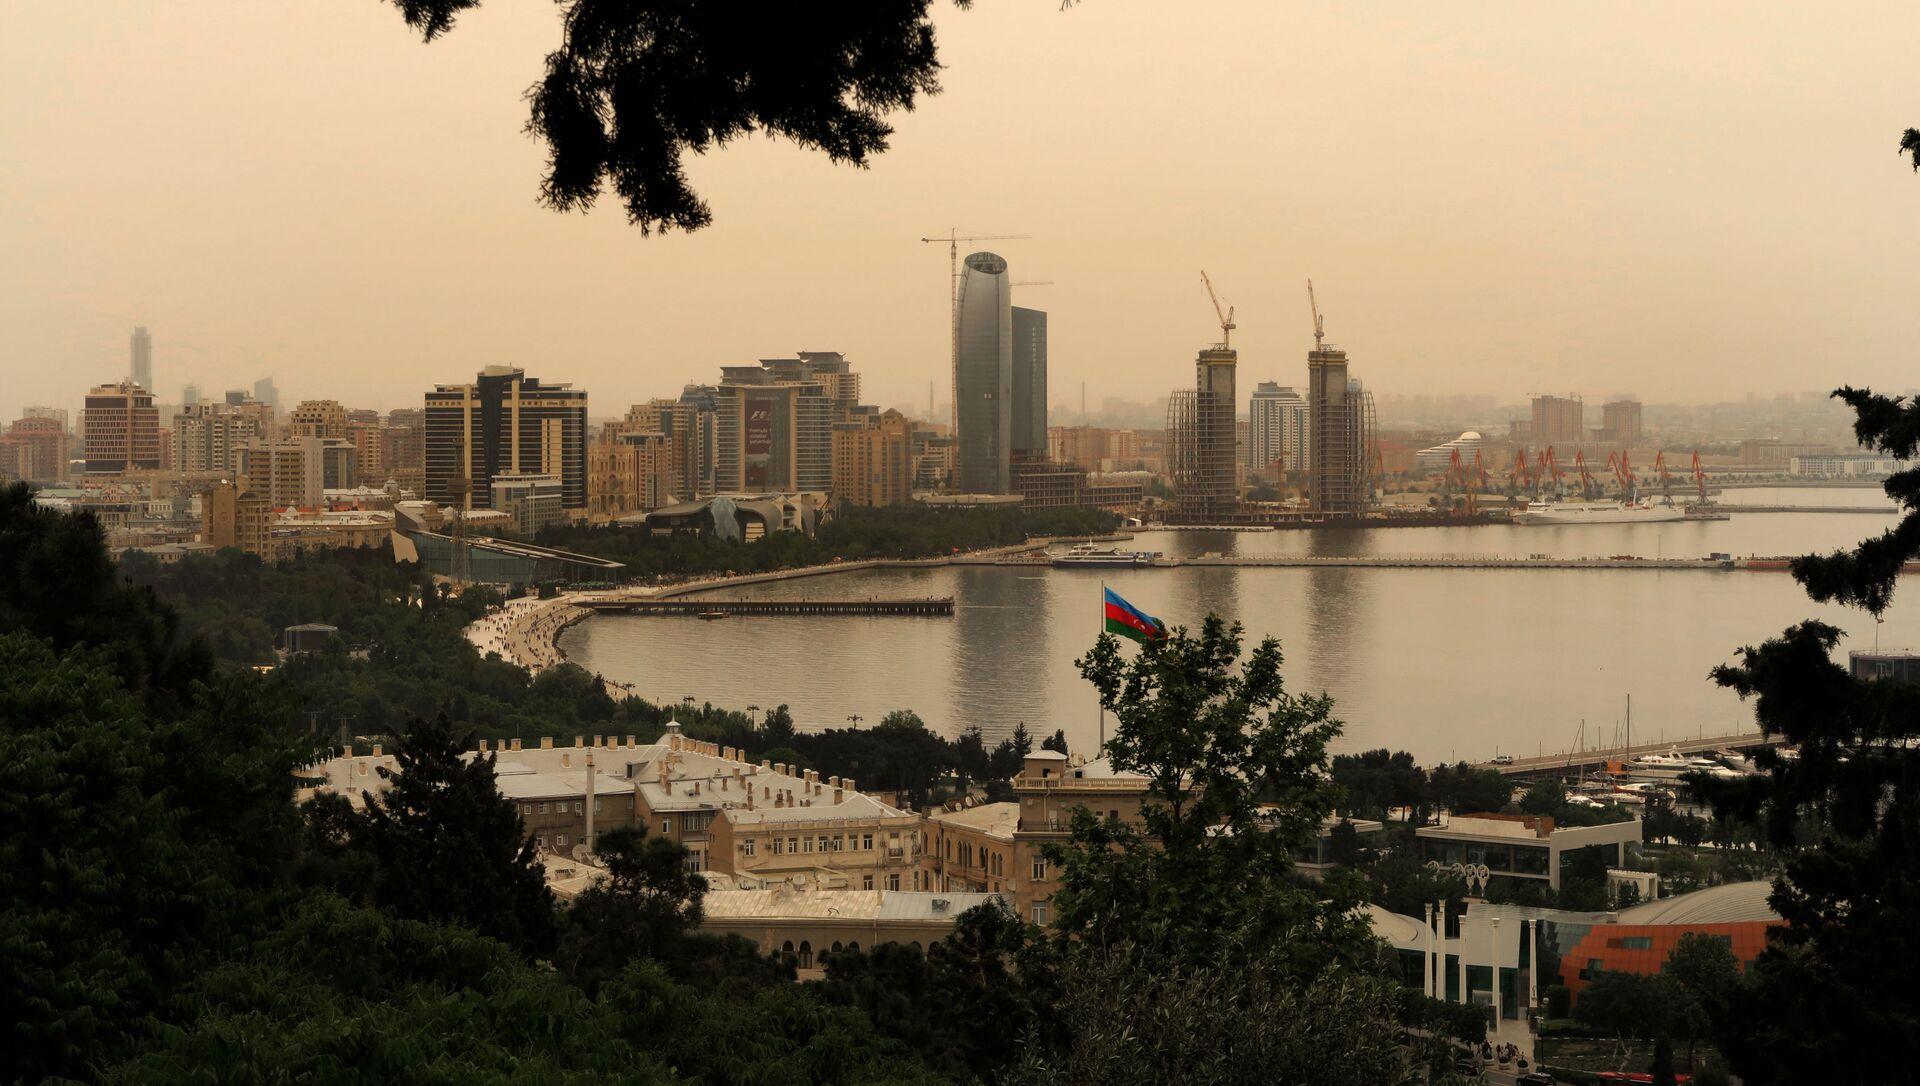 Вид на город Баку, фото из архива - Sputnik Азербайджан, 1920, 09.03.2021